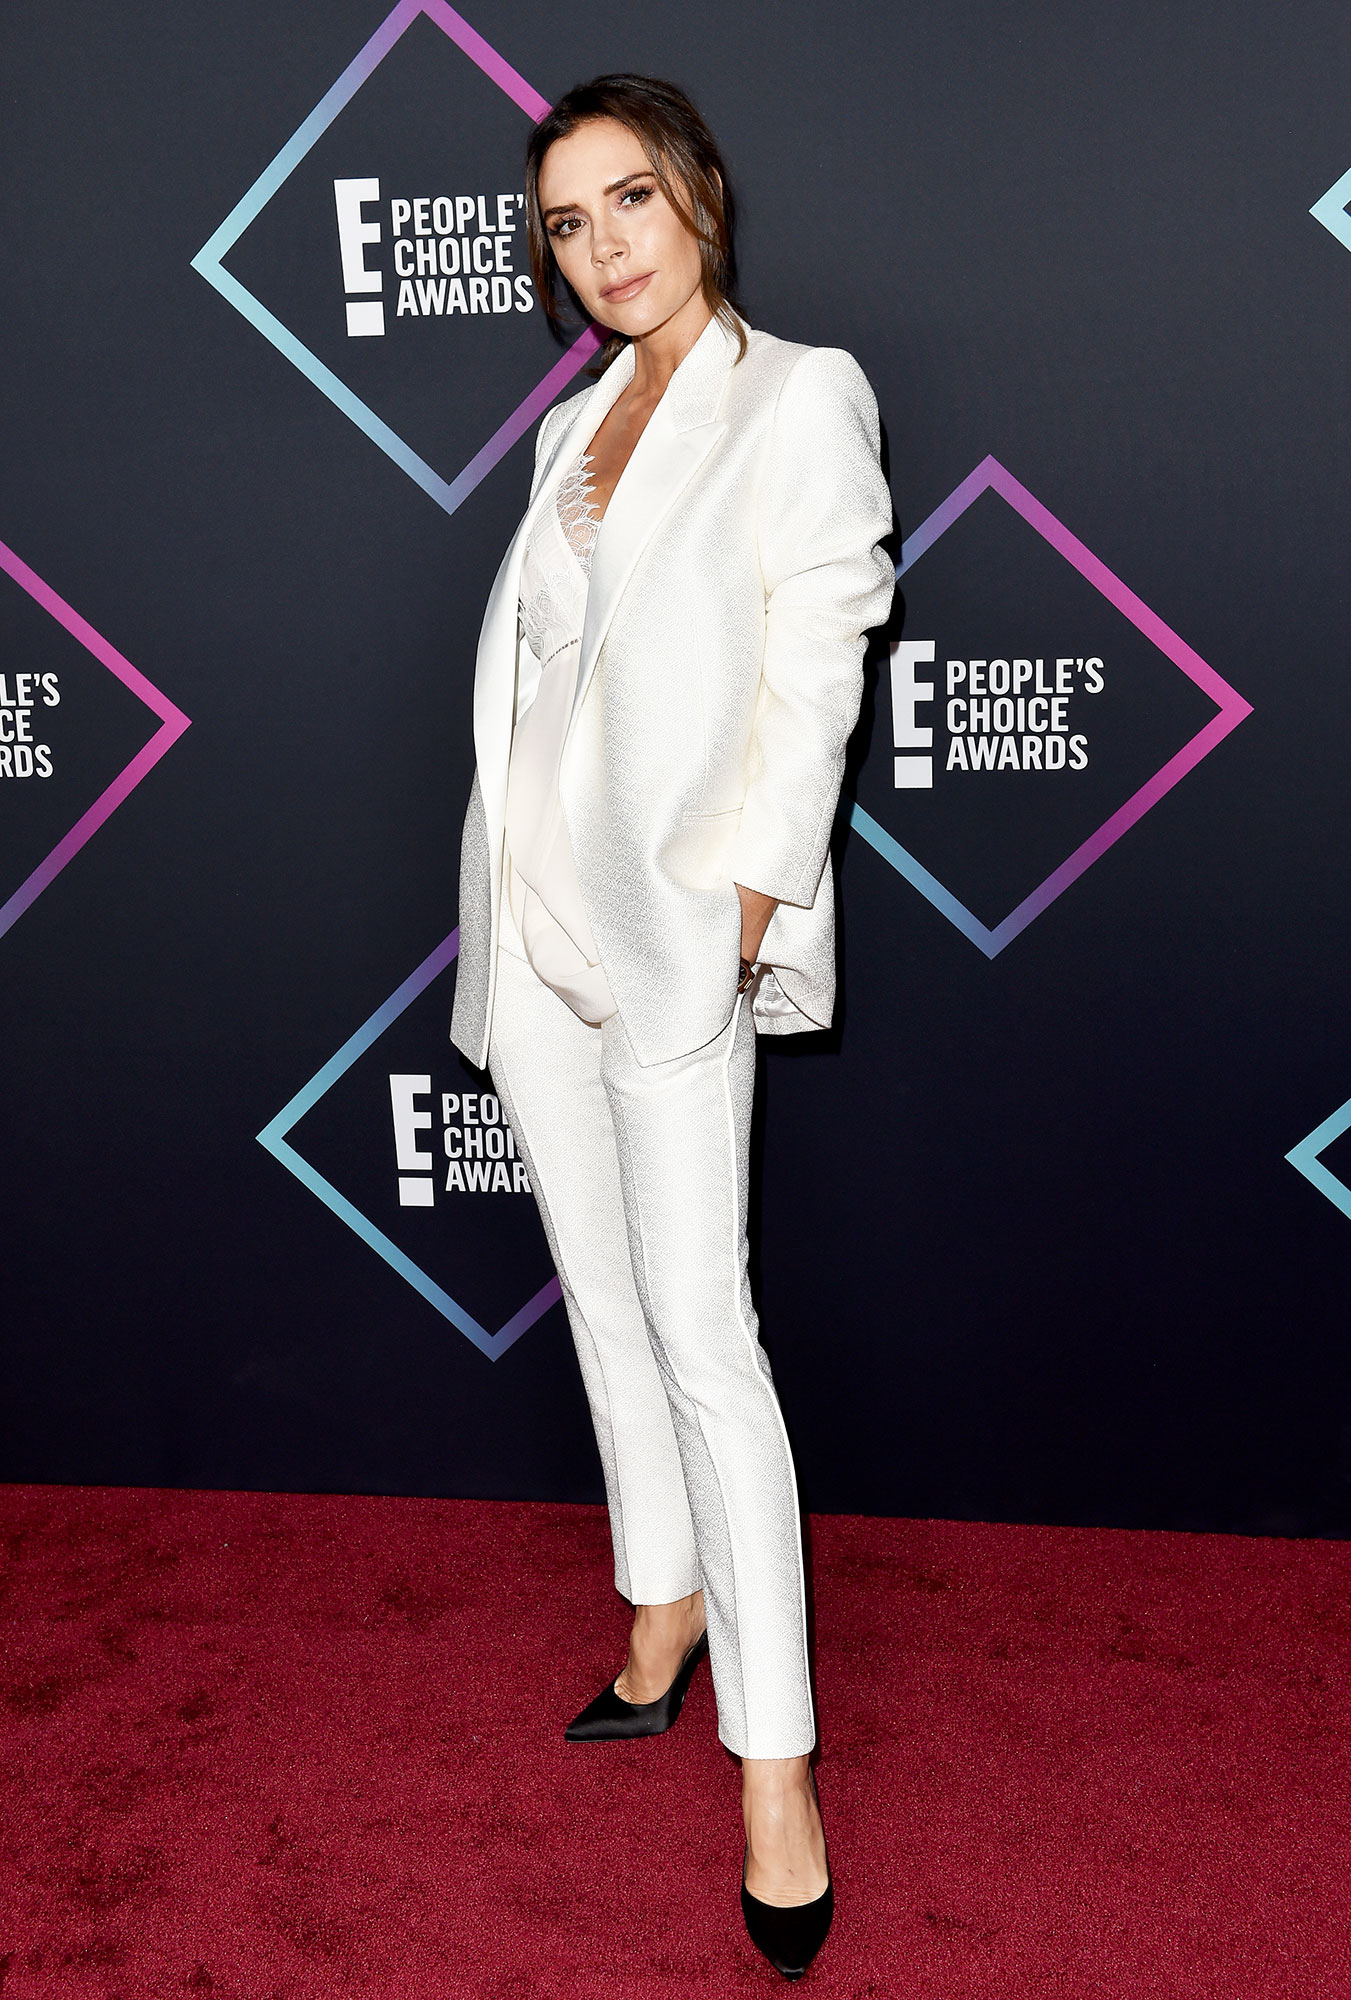 Victoria Beckham People's Choice Awards 2018 - Victoria Beckham attends the People's Choice Awards 2018 at Barker Hangar on November 11, 2018 in Santa Monica, California.